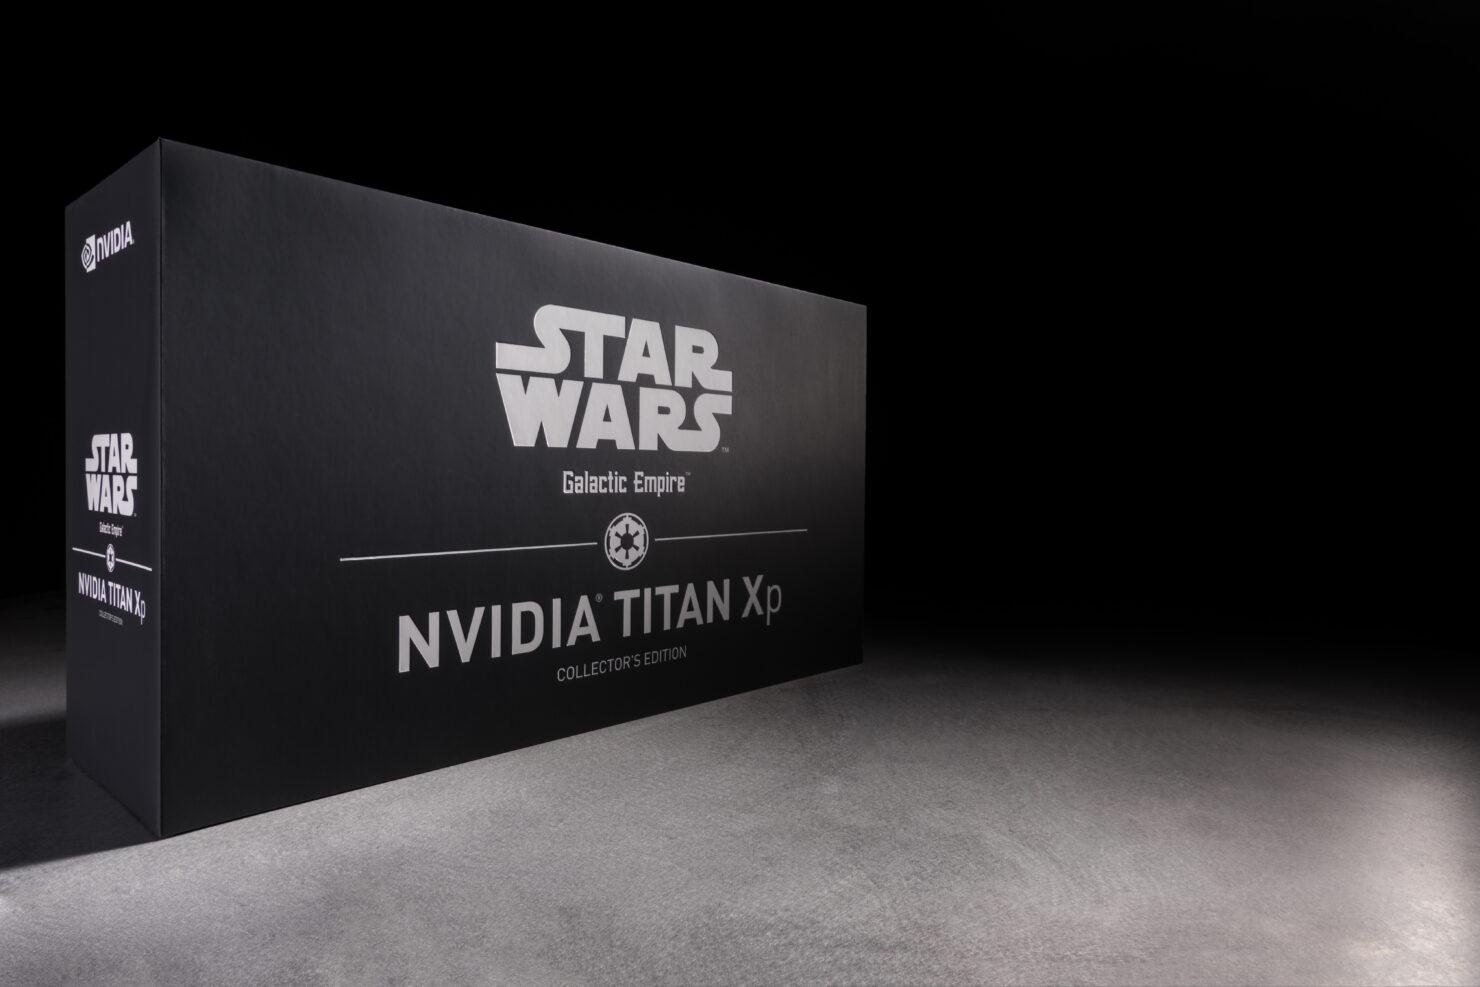 nvidia-geforce-titan-xp-star-wars-collectors-edition-galactic-empire-packaging-photo-003